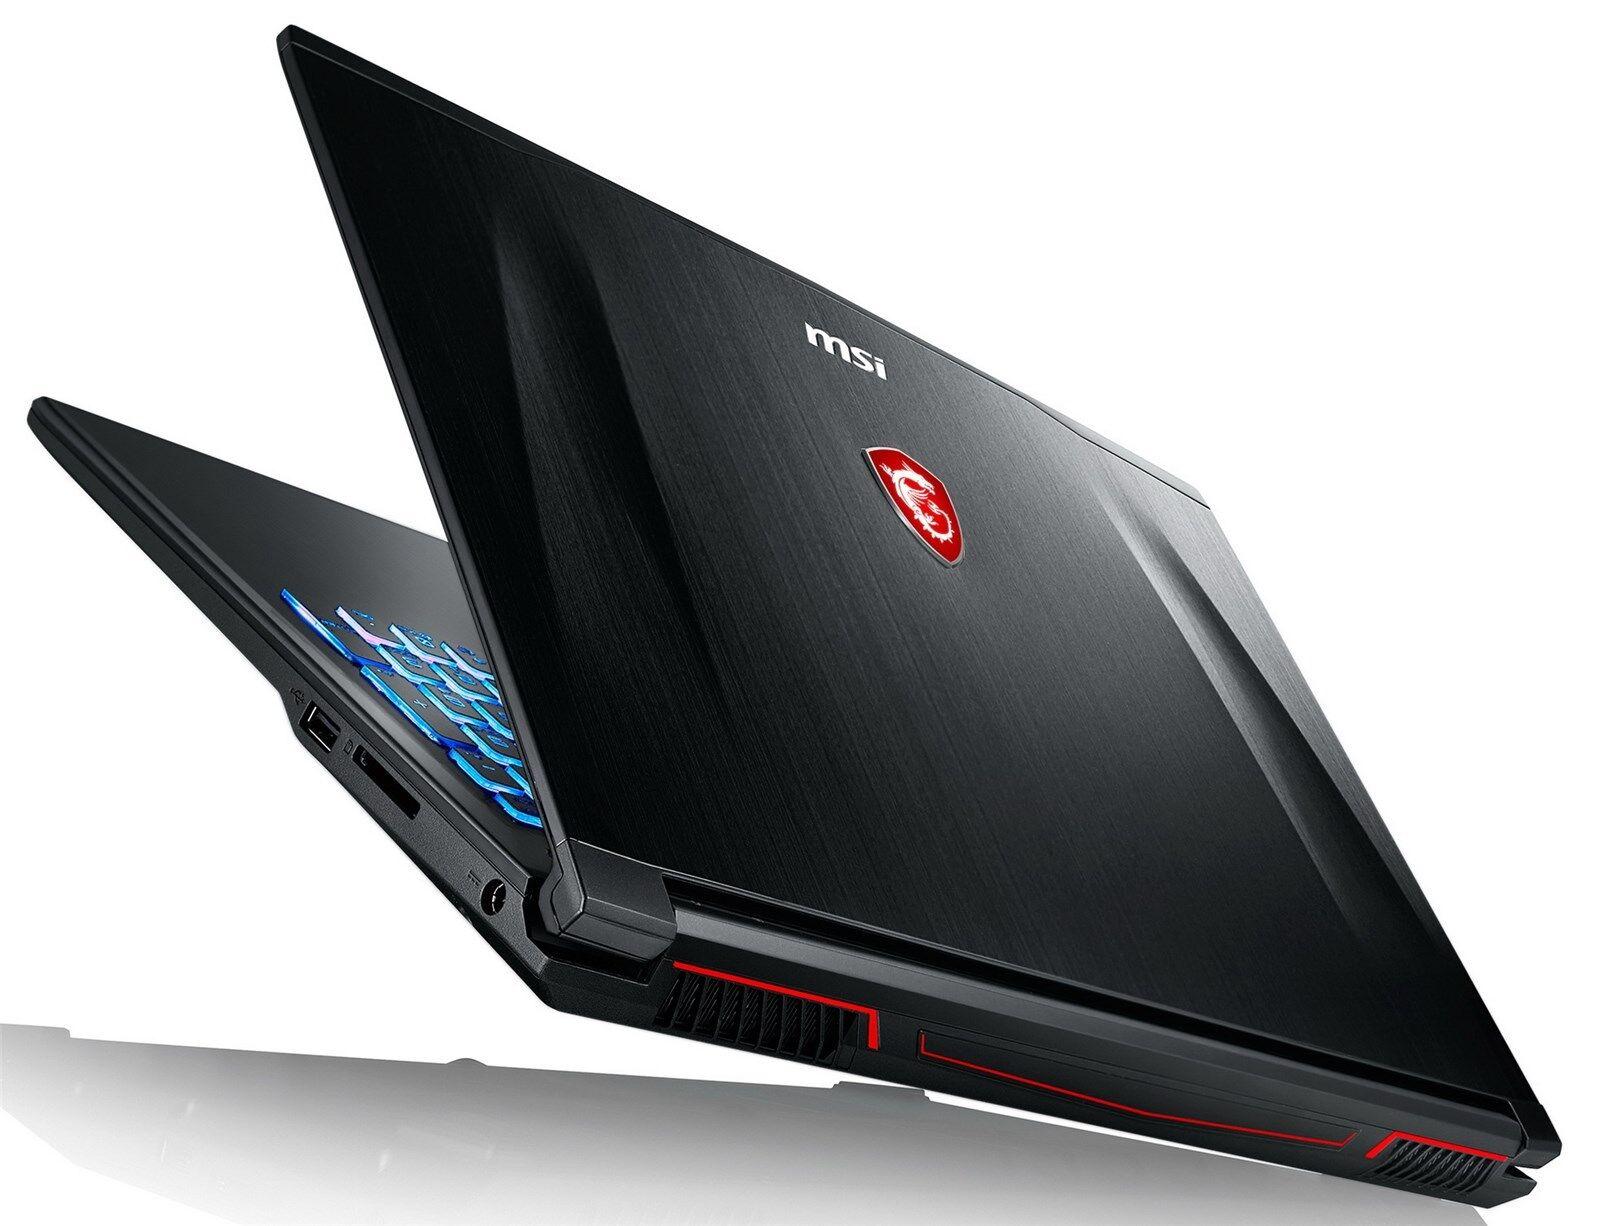 MSI Gaming GF62 7RE 2096 i7-7700HQ, 1TB, 16GB, nVIDIA GTX 1050Ti 4GB,